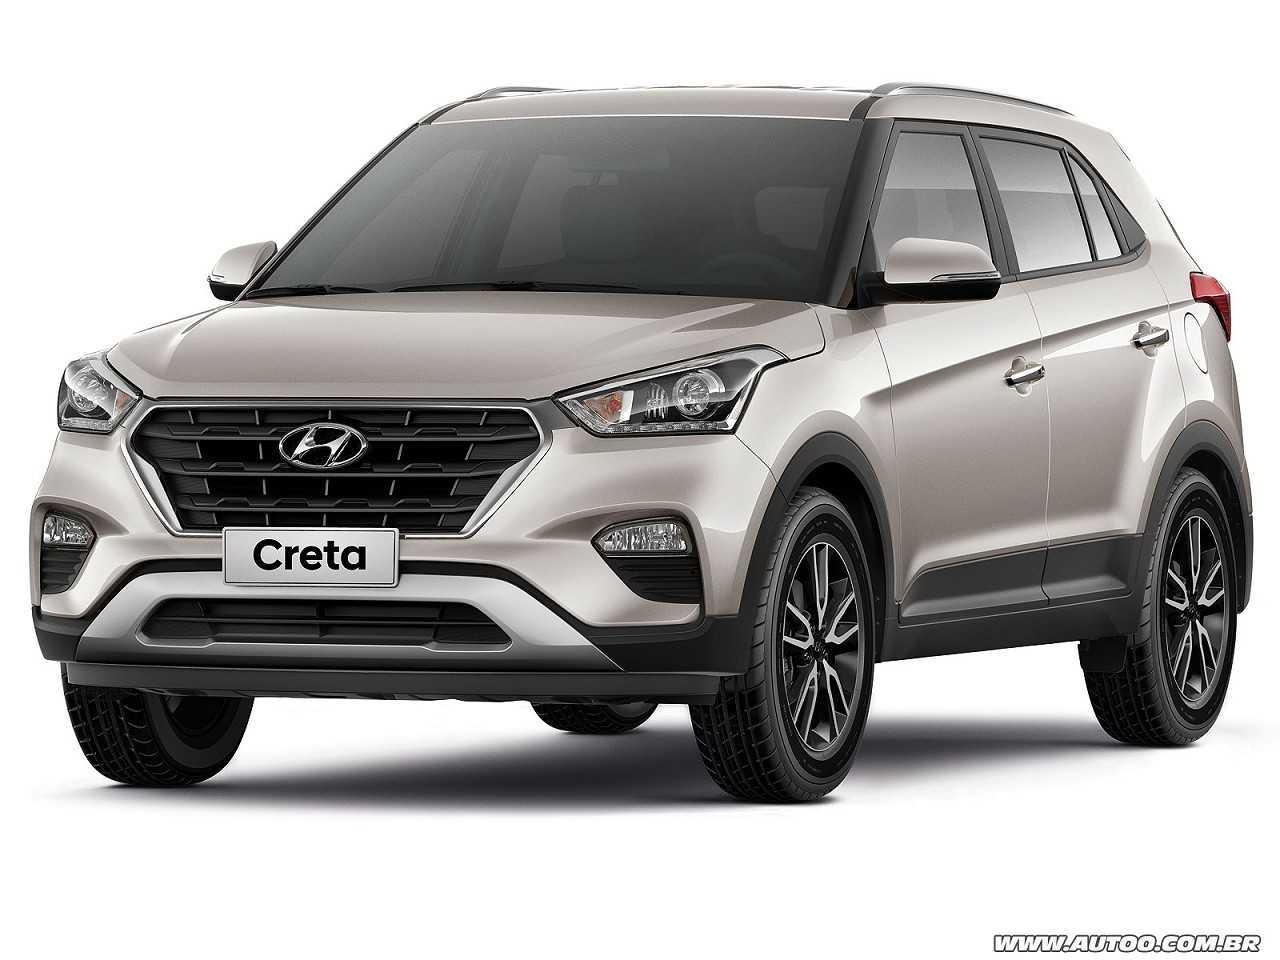 HyundaiCreta 2017 - ângulo frontal